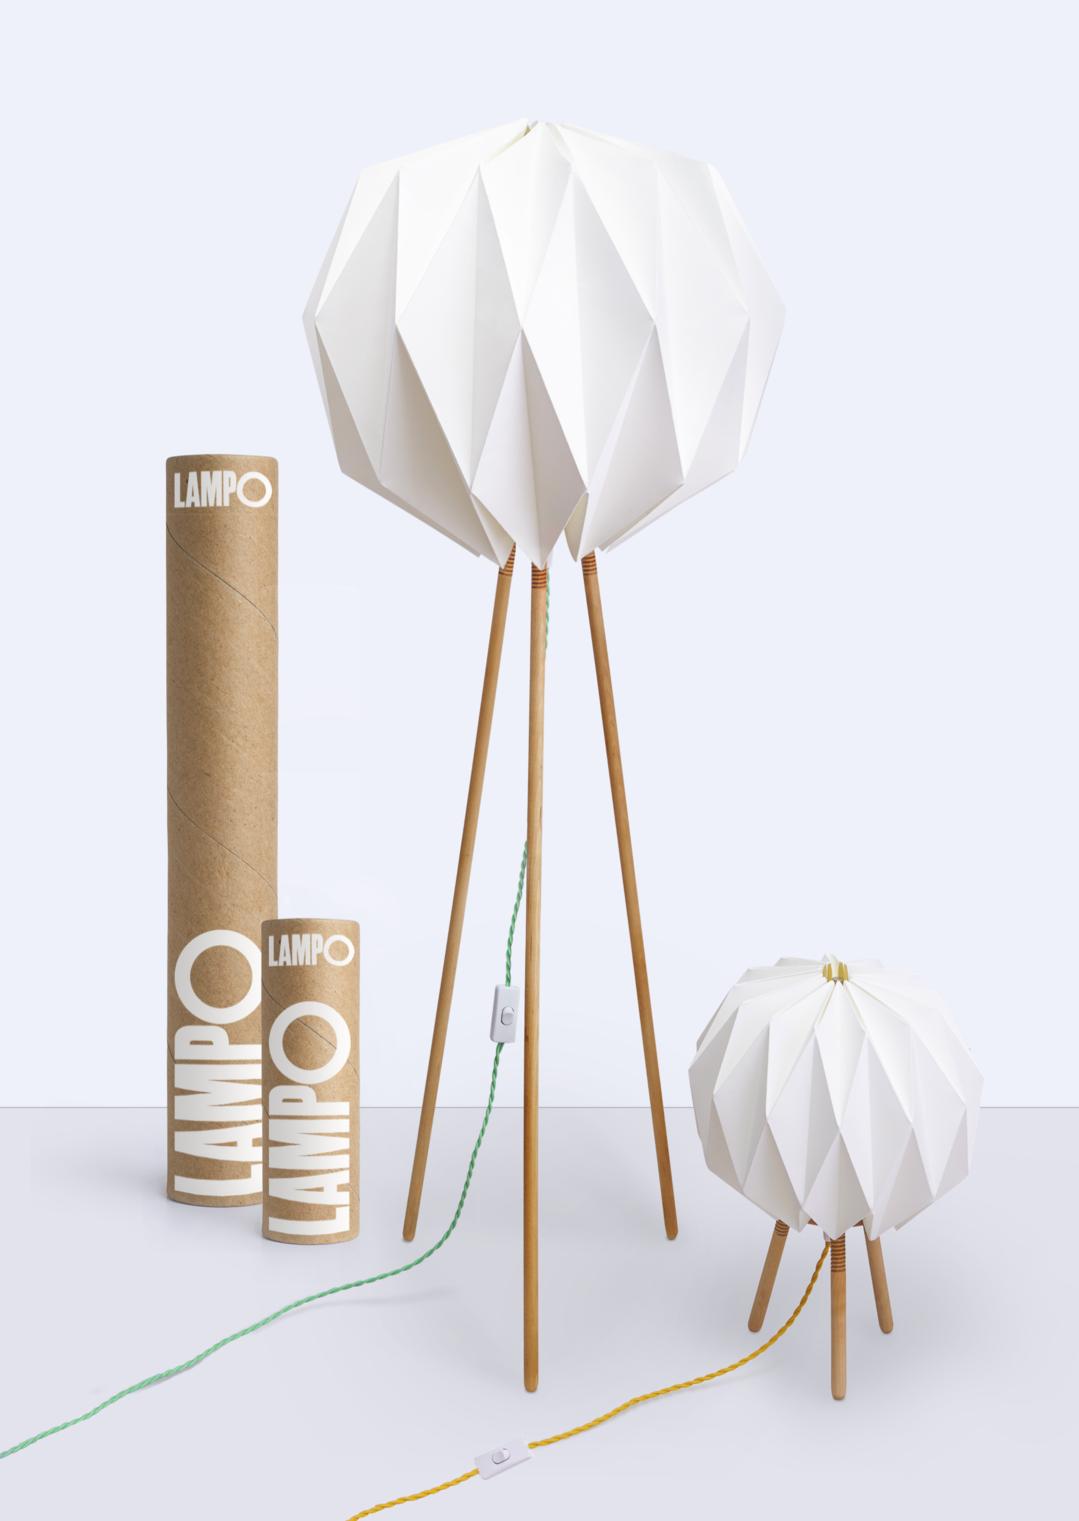 Kasia_Ozmin_Lindsay_Richardson_lampo_origami_lamp_02